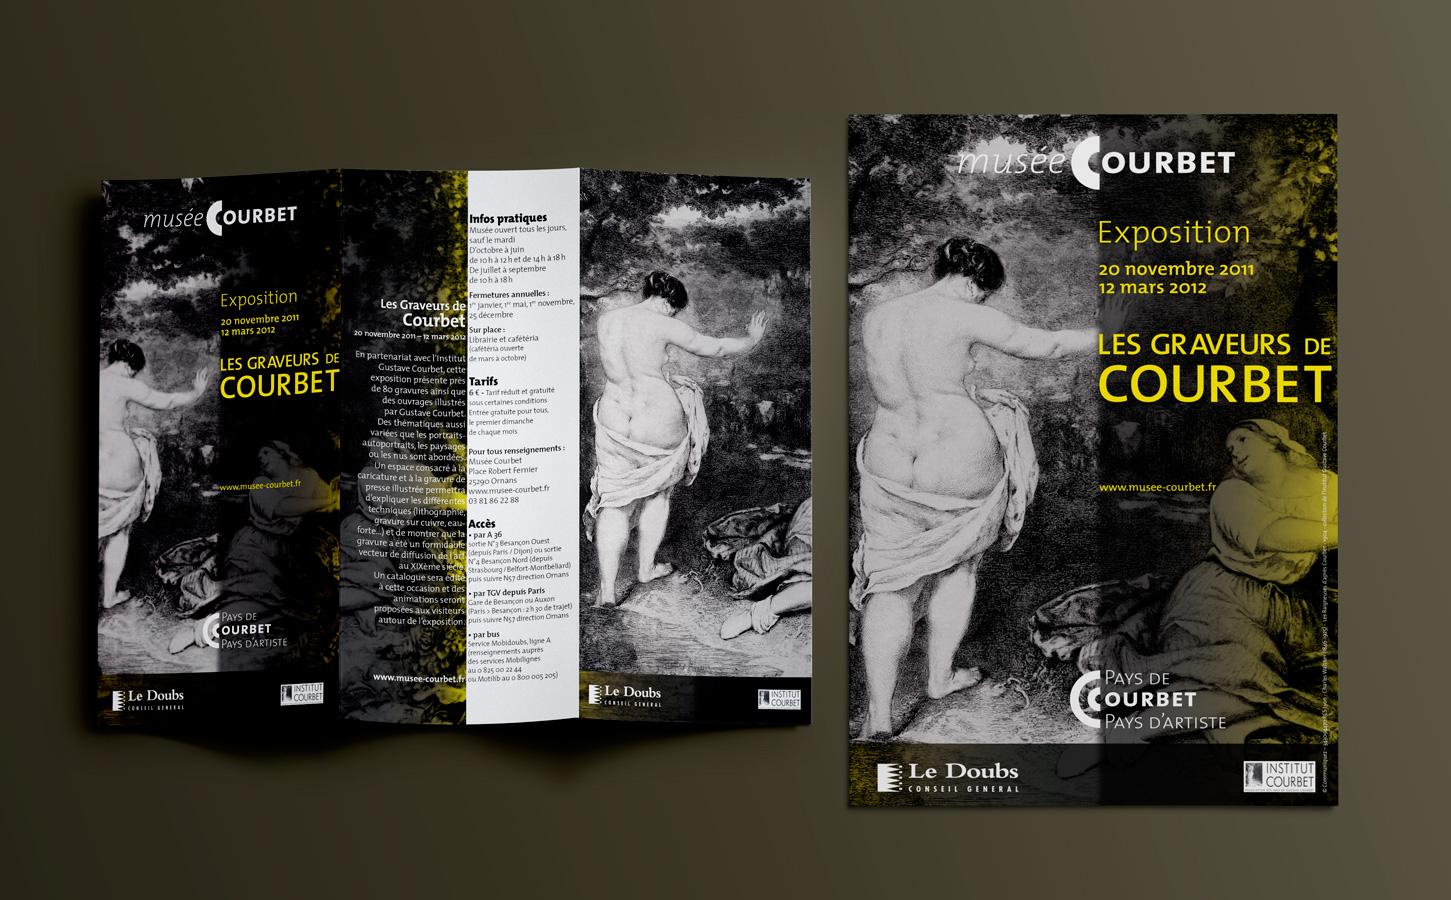 MockUp_courbet_Flyer_2.jpg